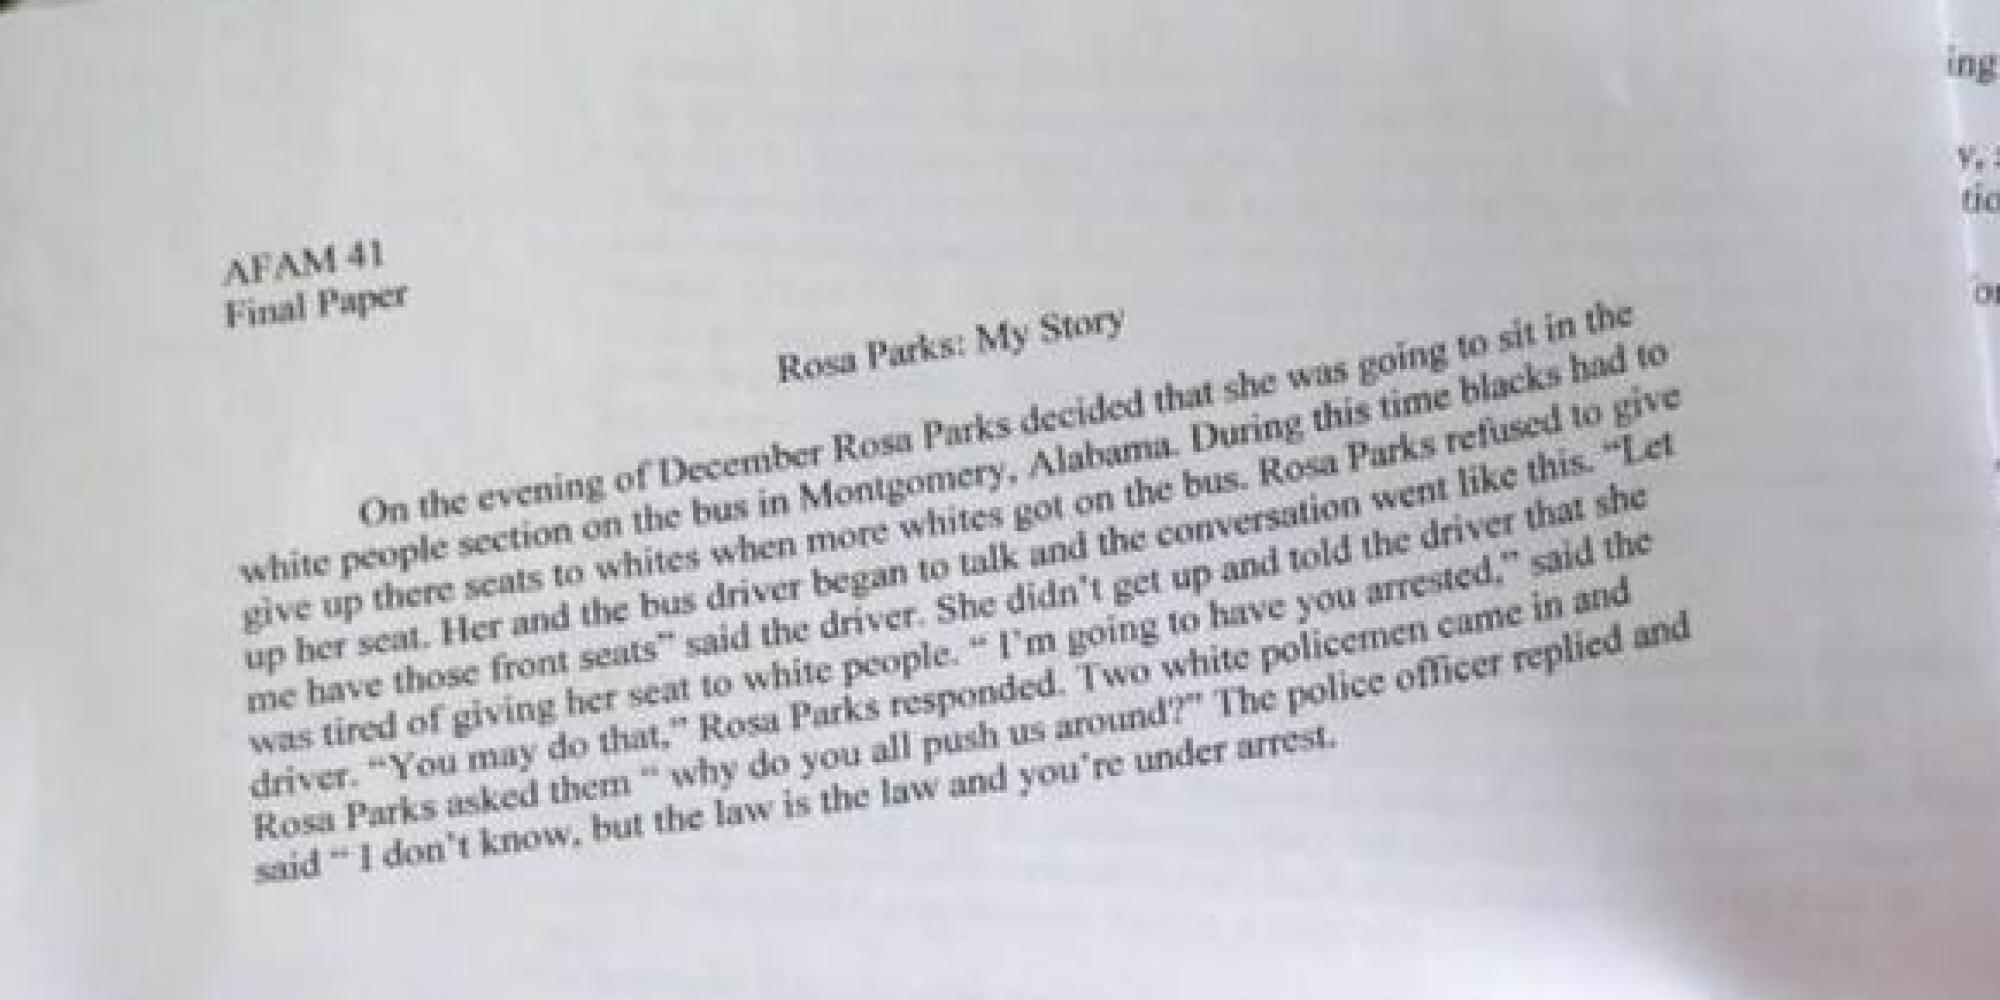 Essay on Rosa Parks